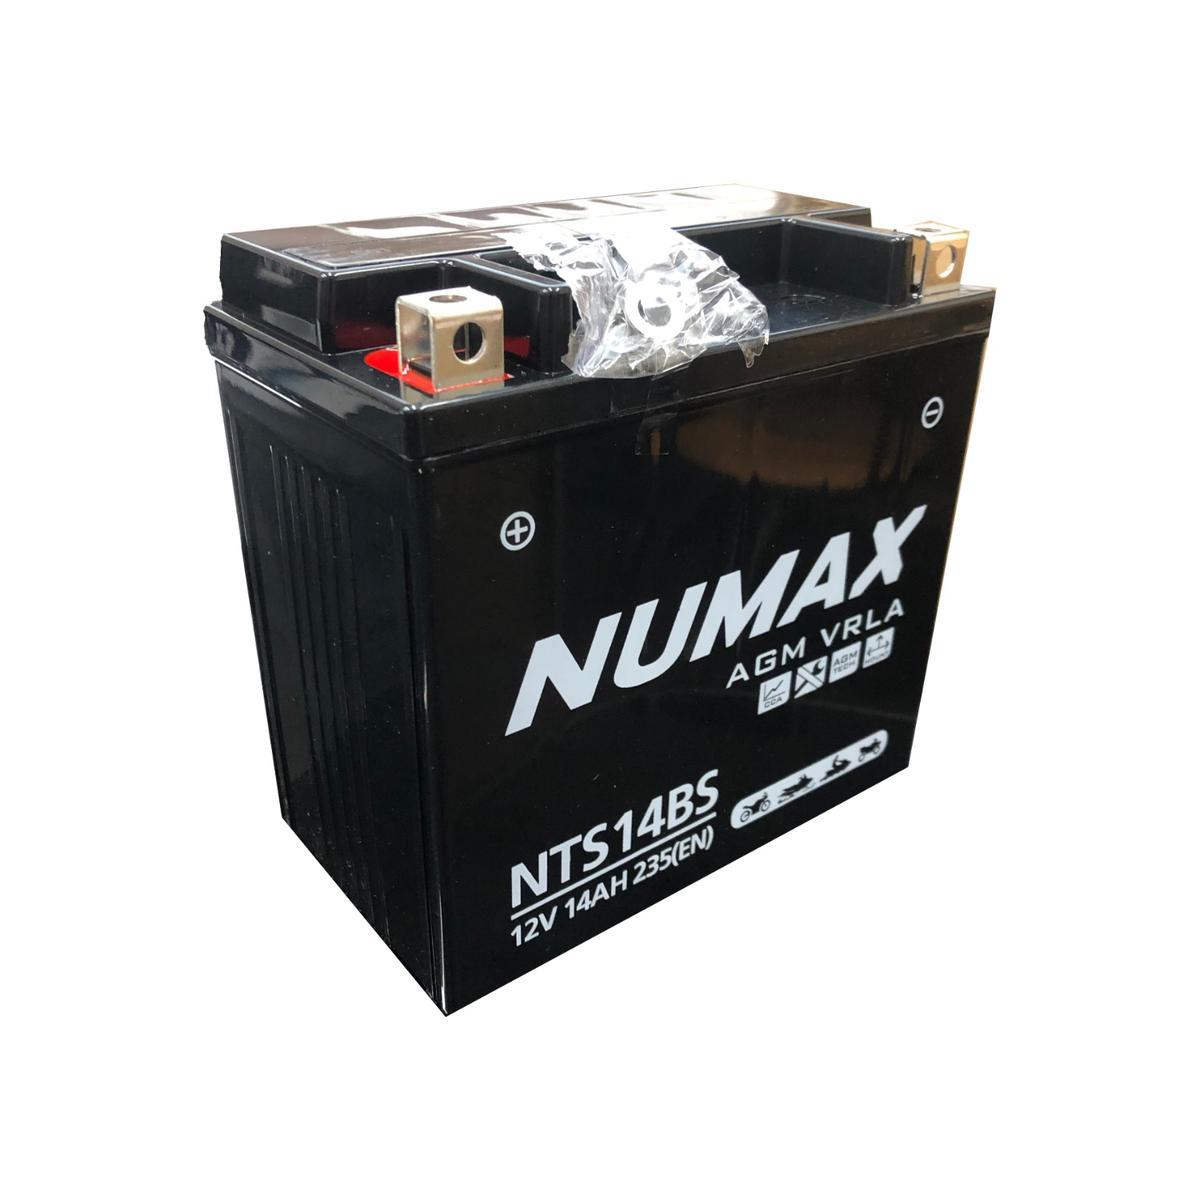 Numax NTS14BS 12v Motorbike Bike Battery KAWASAKI 800cc VN800 A1 YTX14-4